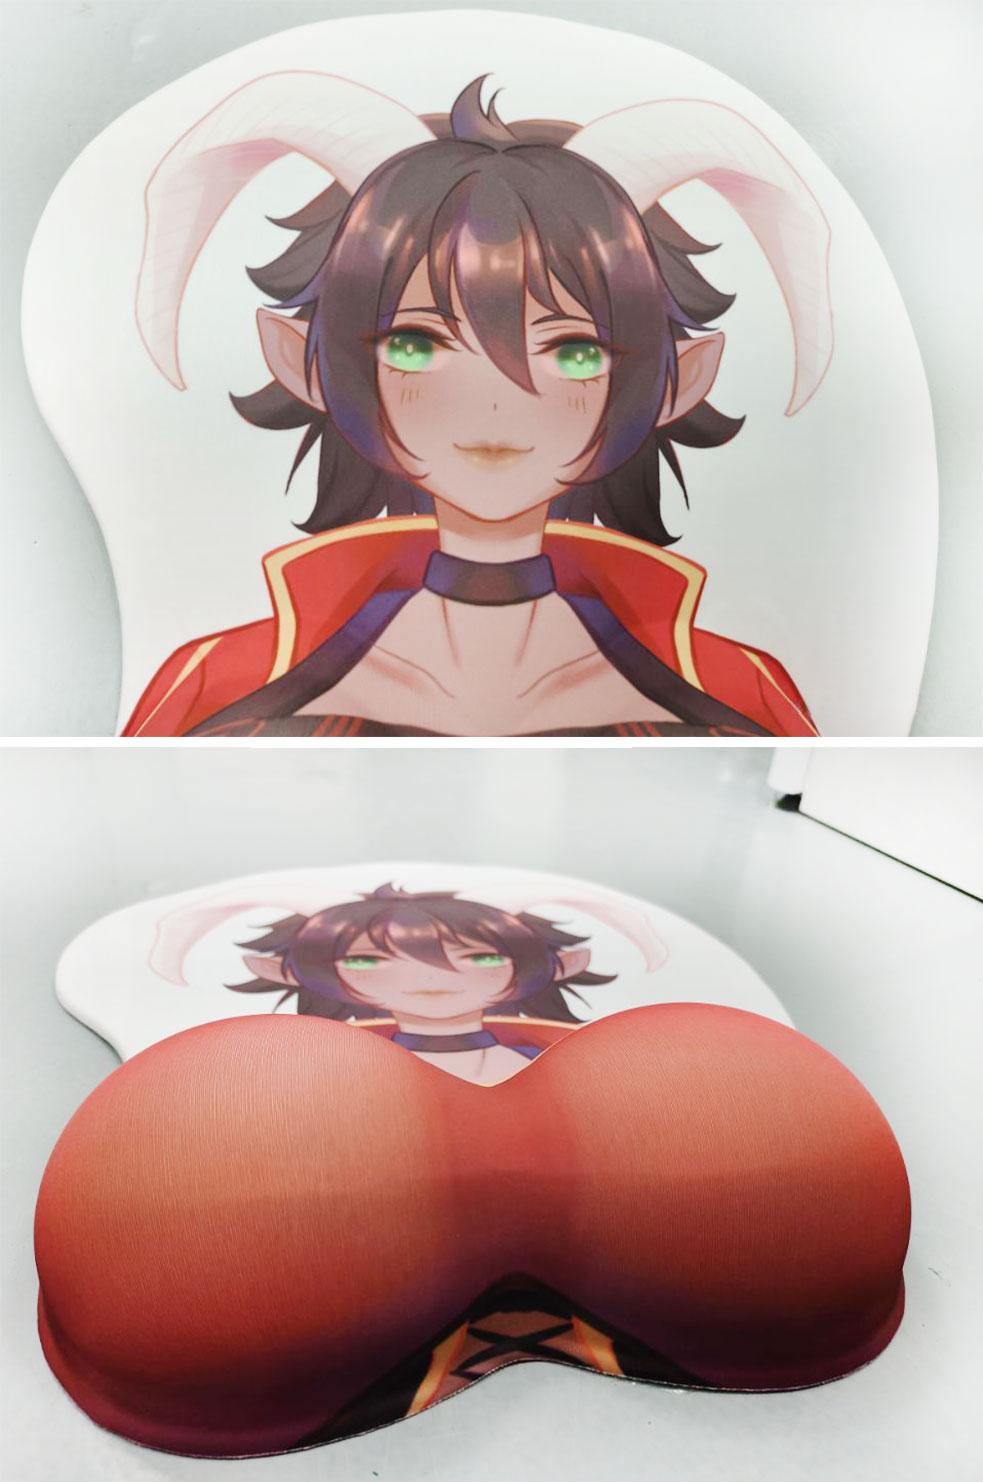 akua minato life size oppai mousepad akua minato giant oppai mouse pad 4900 - Anime Mousepads